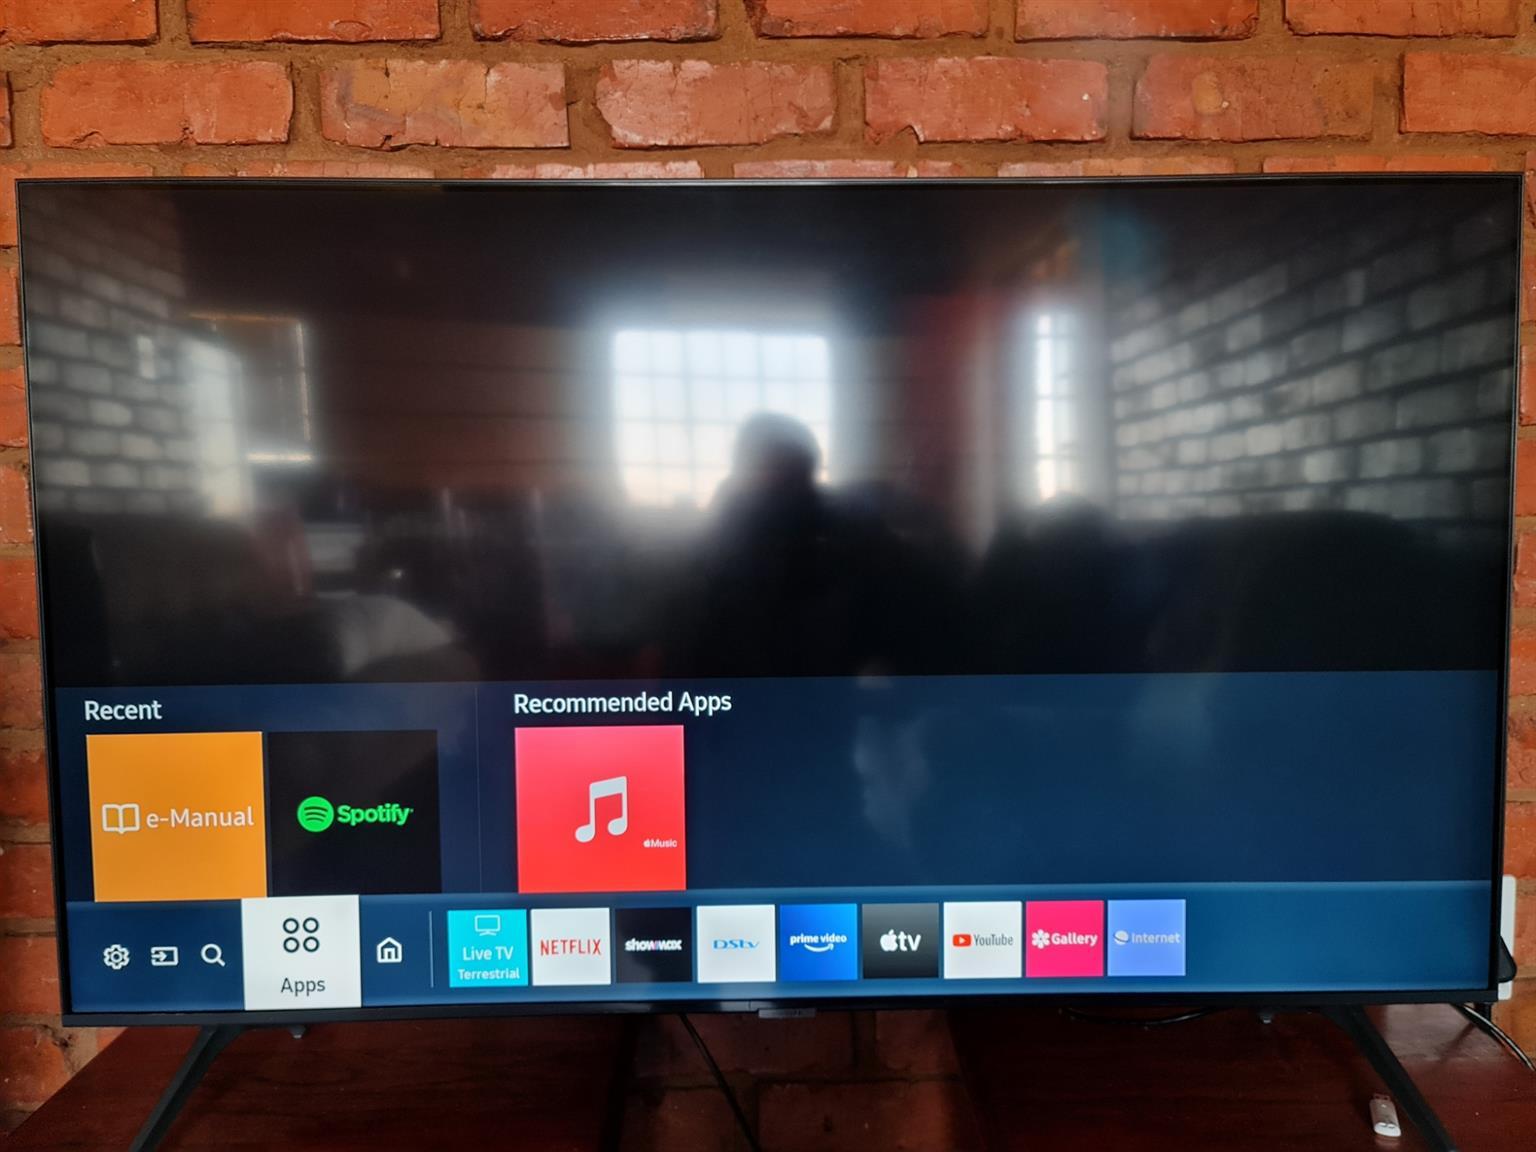 New Samsung 50 inch UHD smart Tv